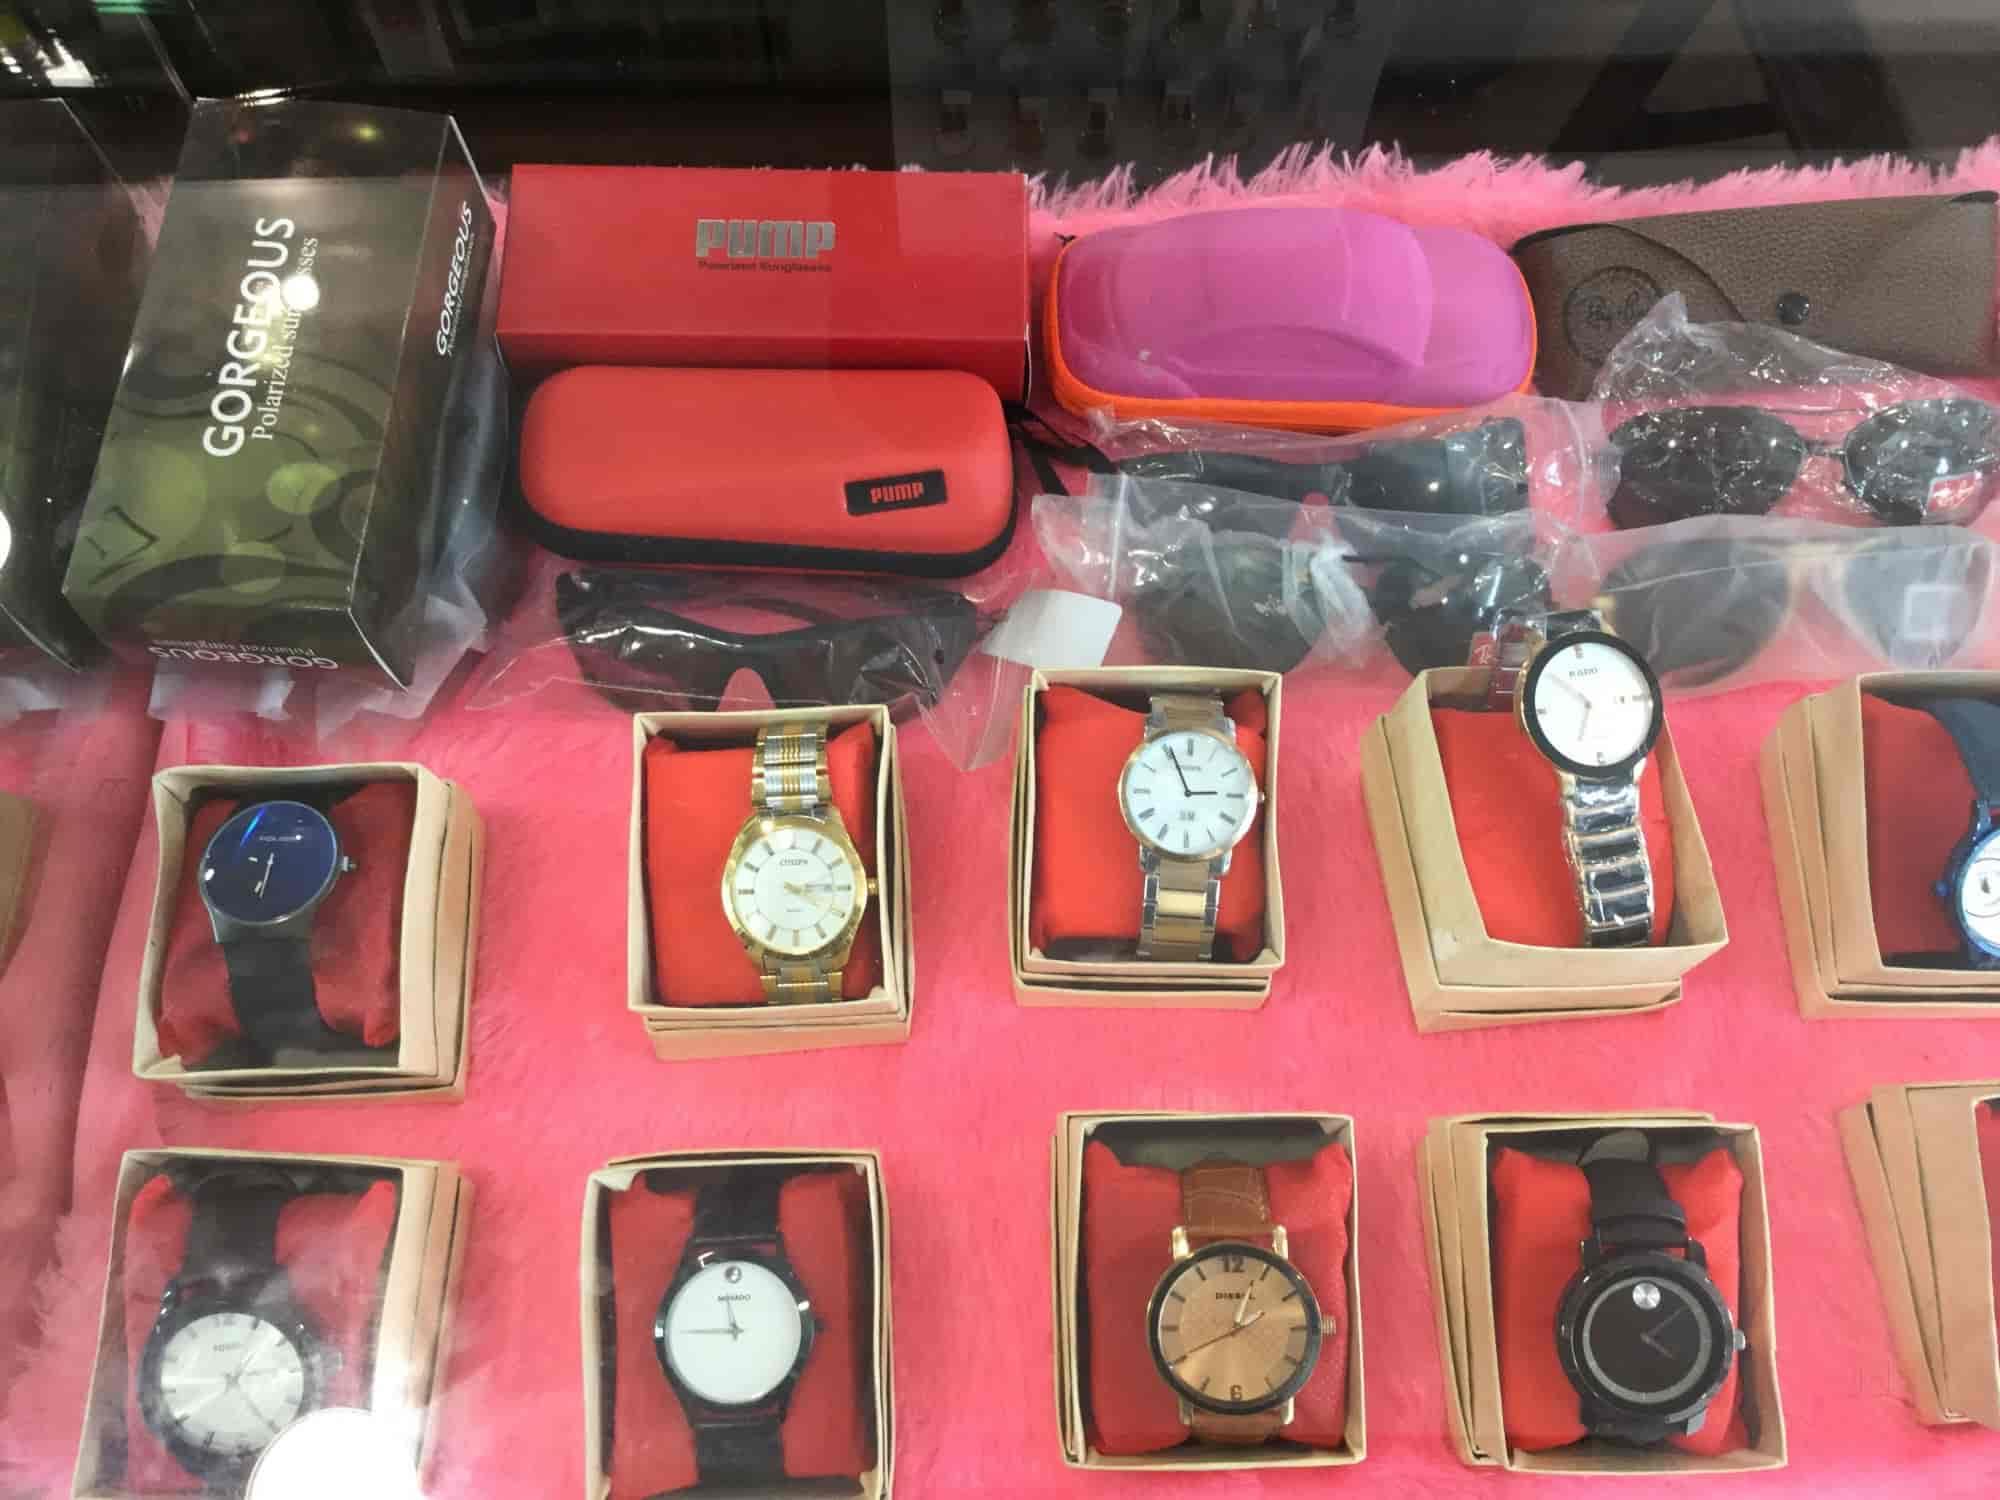 Novelty Hub, Citylight Road - Gift Shops in Surat - Justdial